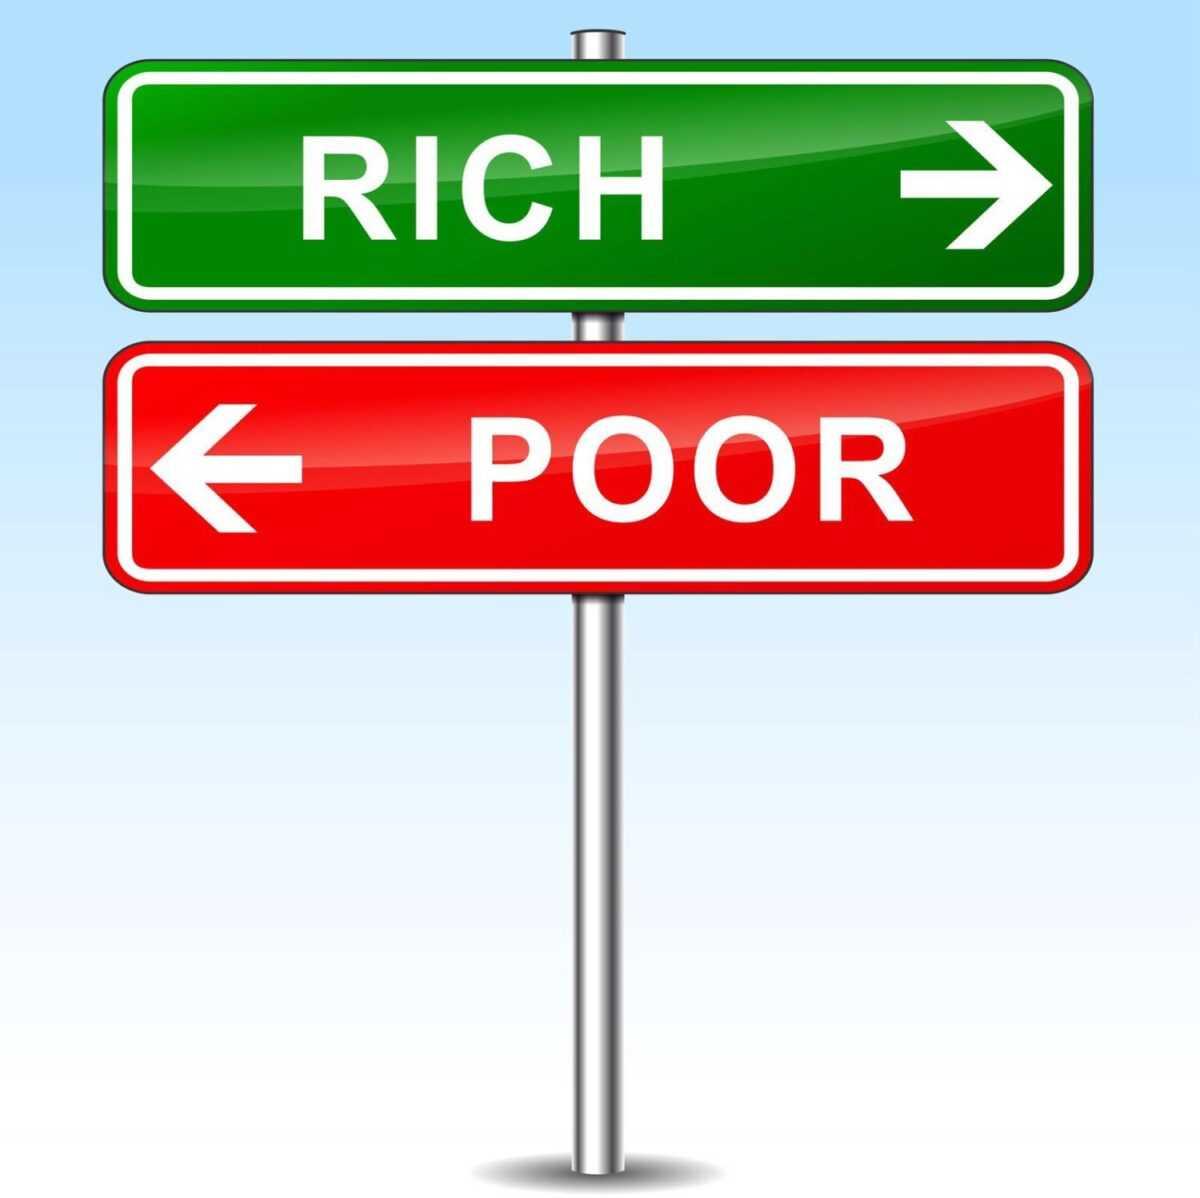 ffd838d9 8447 48d9 94f3 0c9f45fe7b7d 1 - Богатые и бедные – в чем разница?